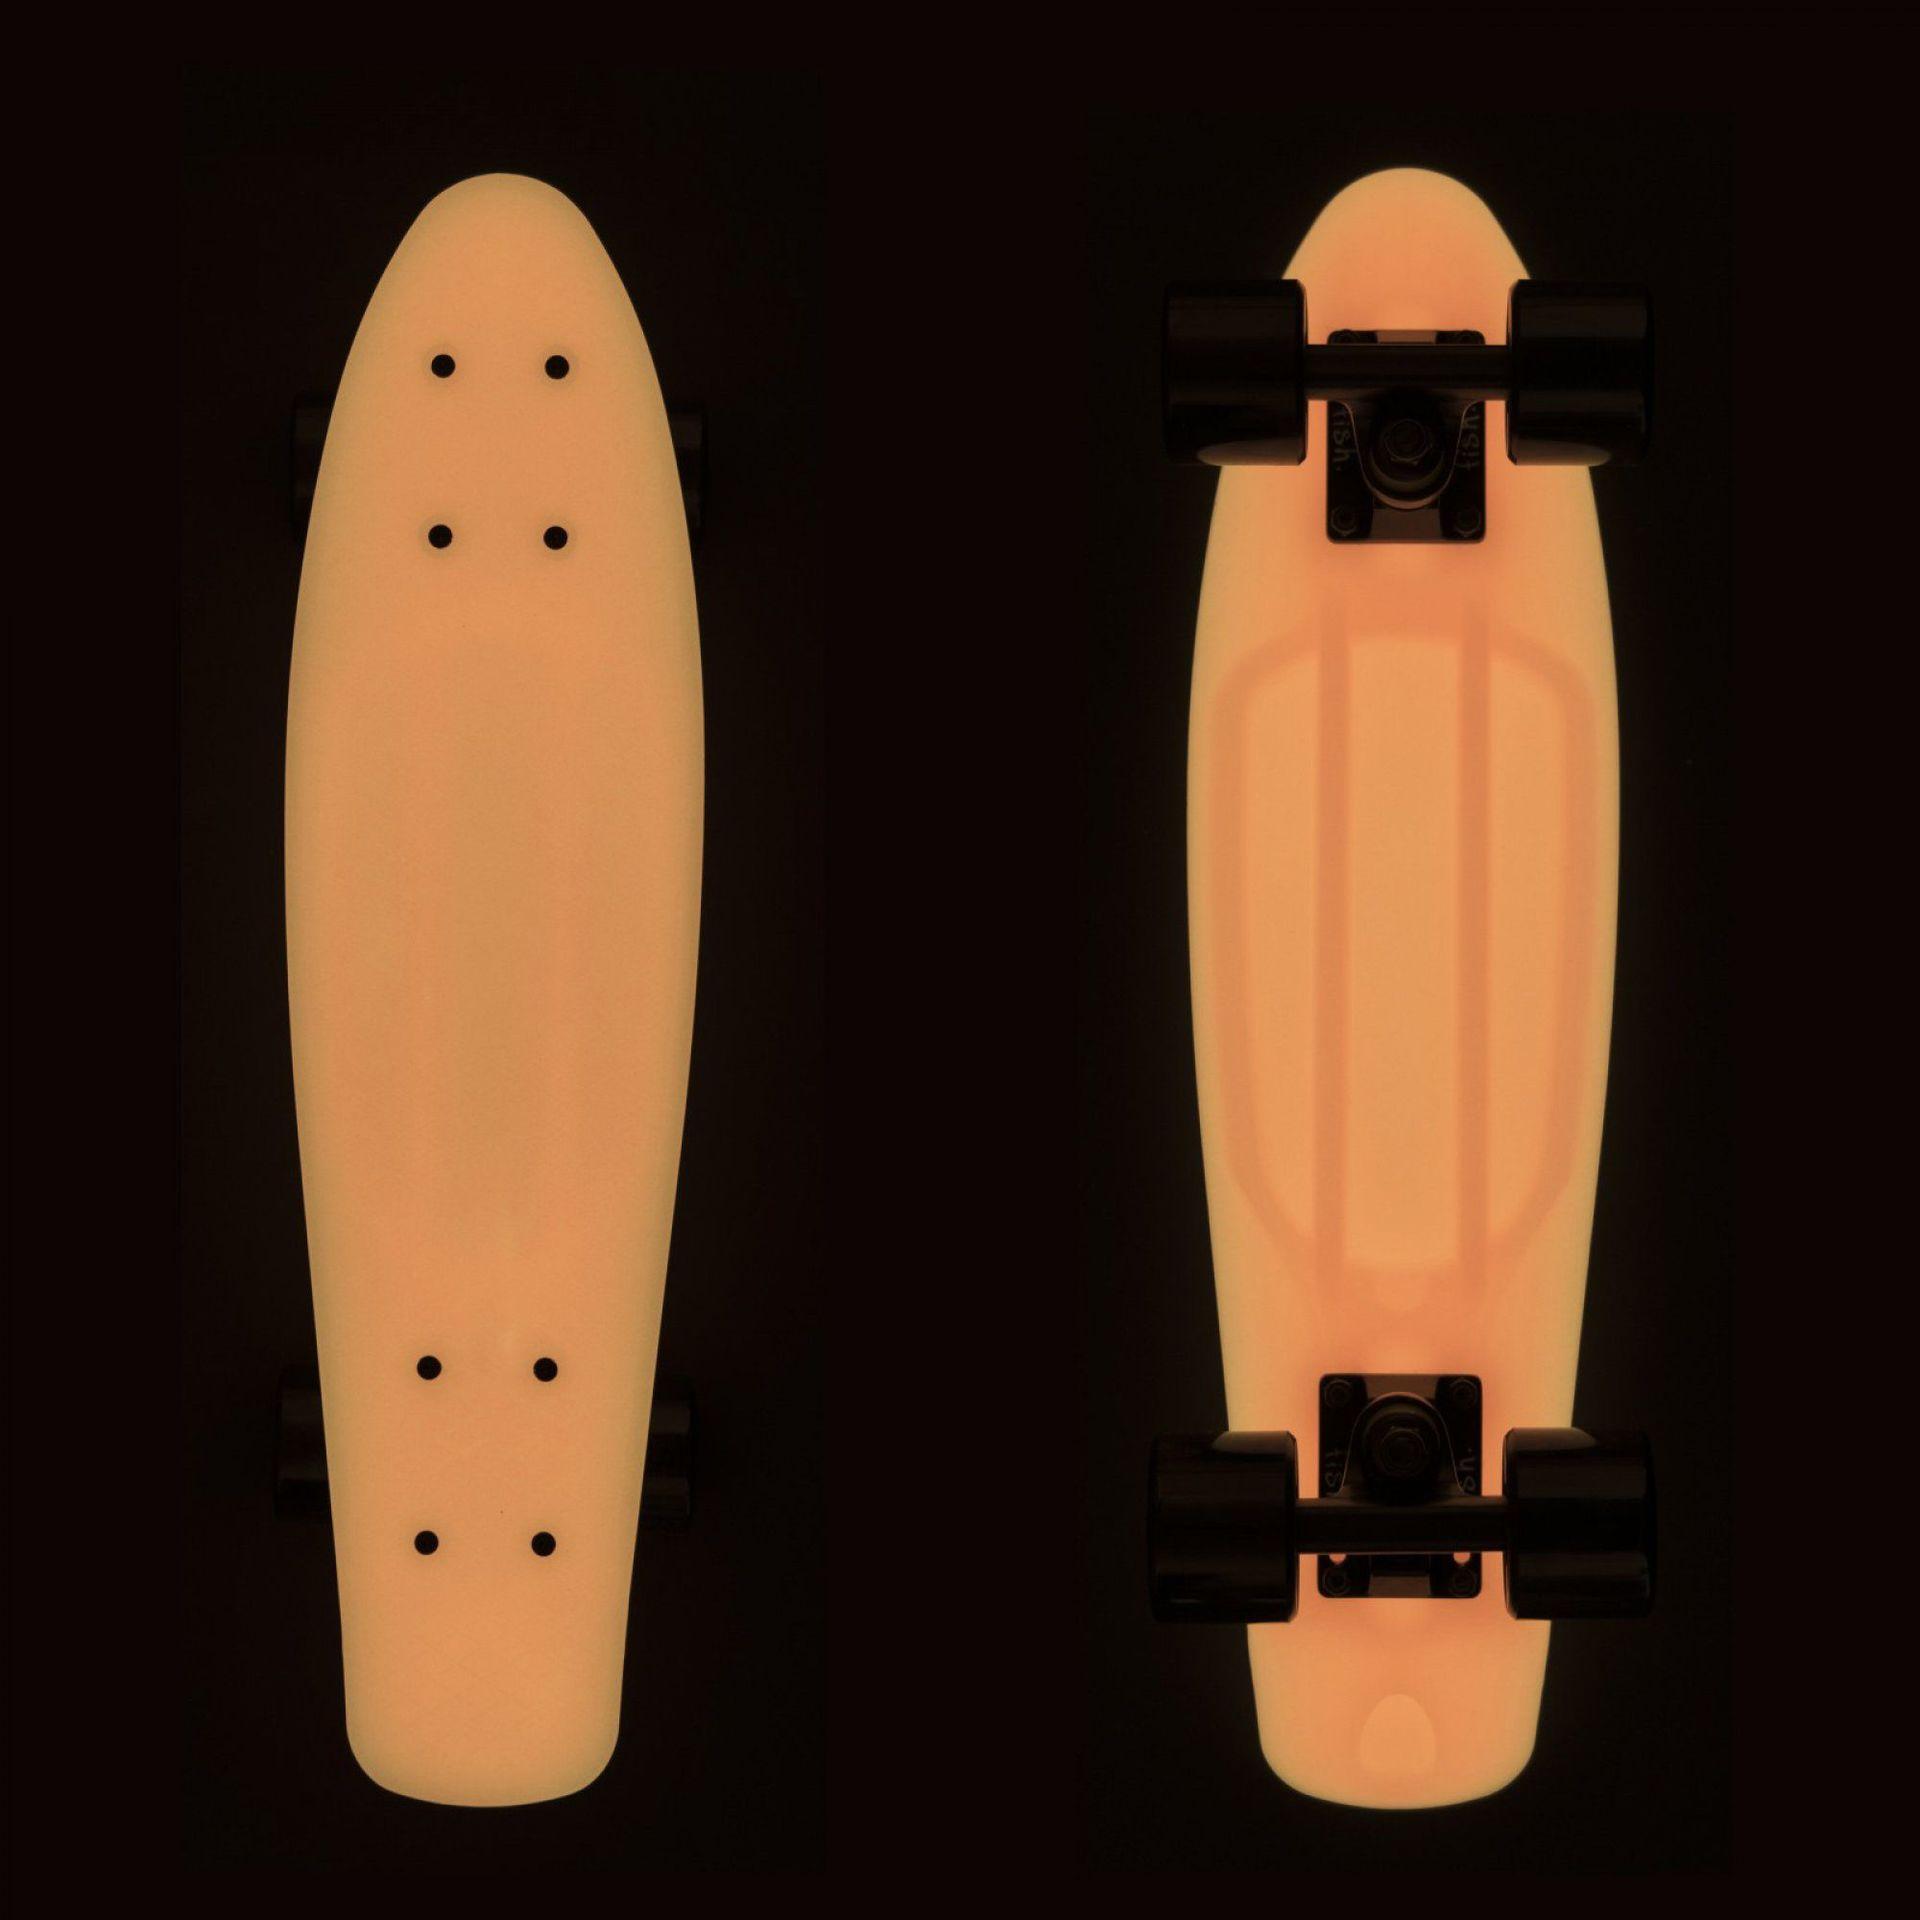 FISHBOARD FISH SKATEBOARDS CLASSIC GLOW ORANGE BLACK 3